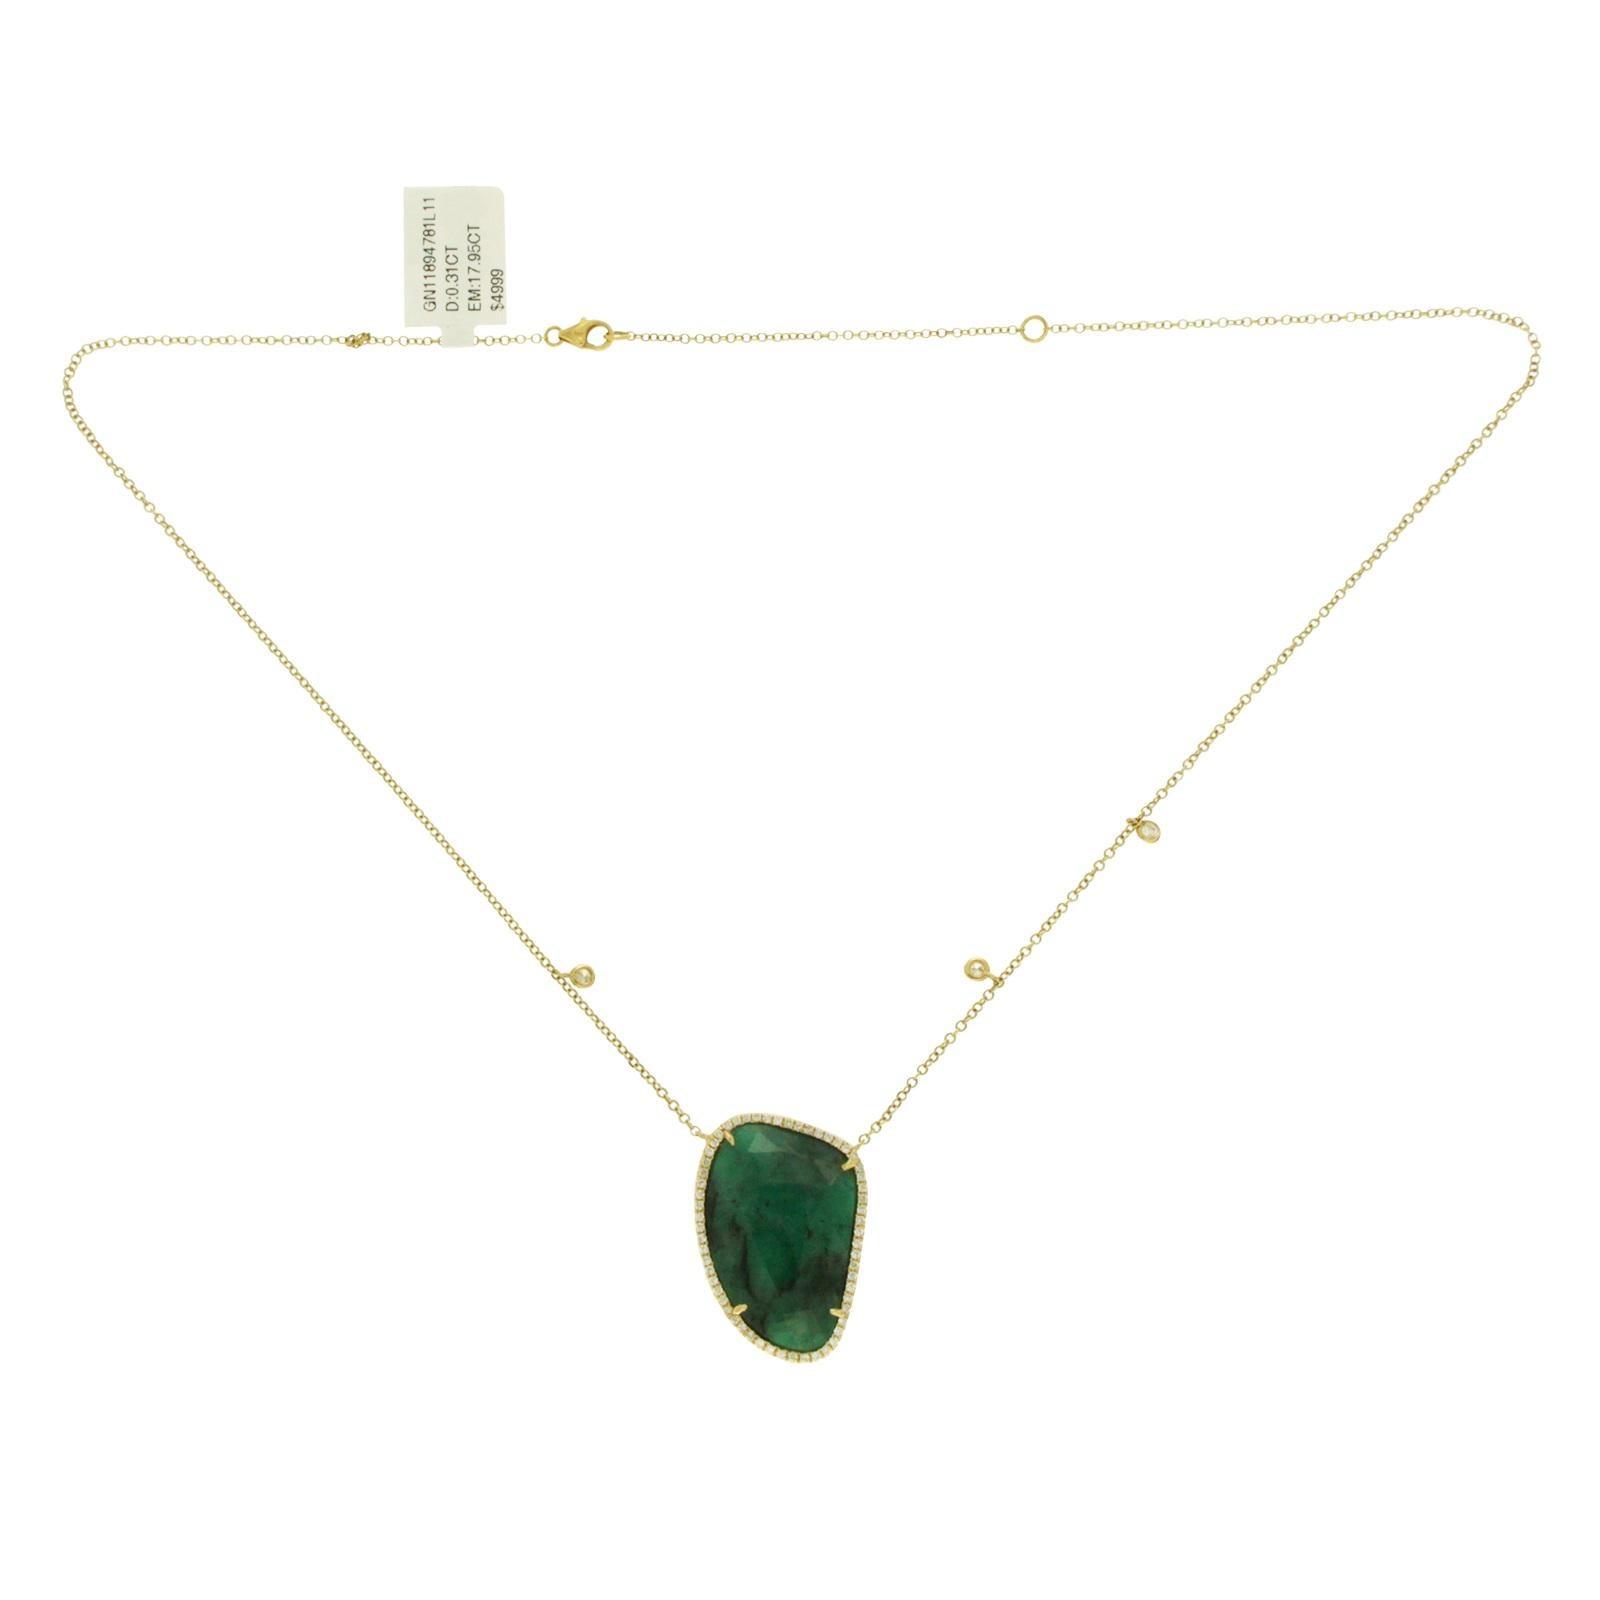 Rose Cut Sliced 17.95 Carat Emerald 0.31 Carat Diamonds 14 Karat Gold Necklace